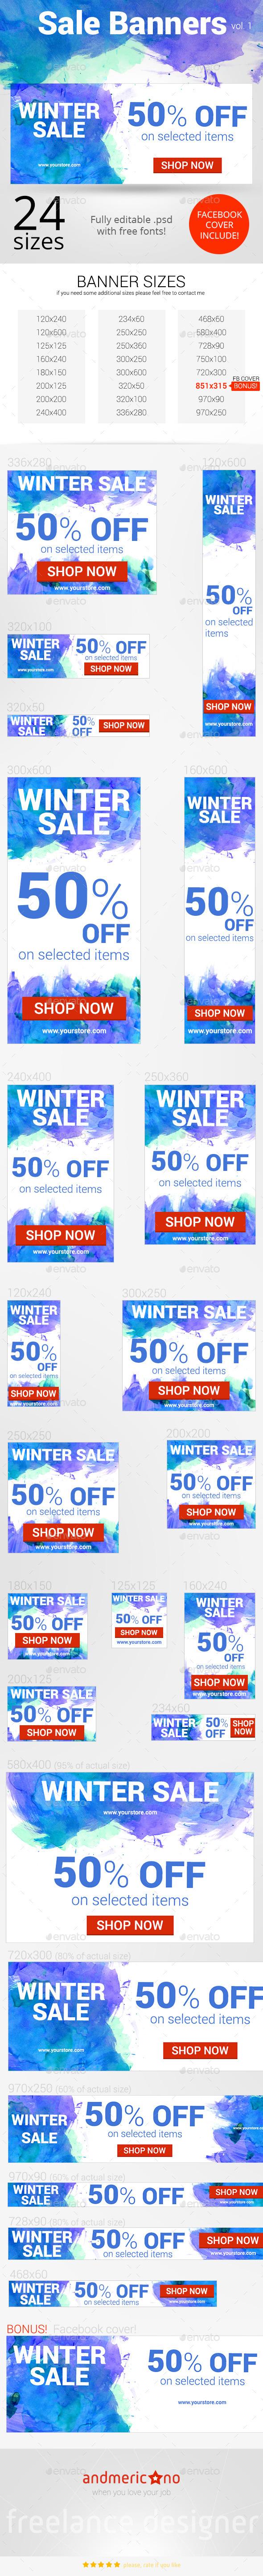 Big Sale Banners Set - Banners & Ads Web Elements